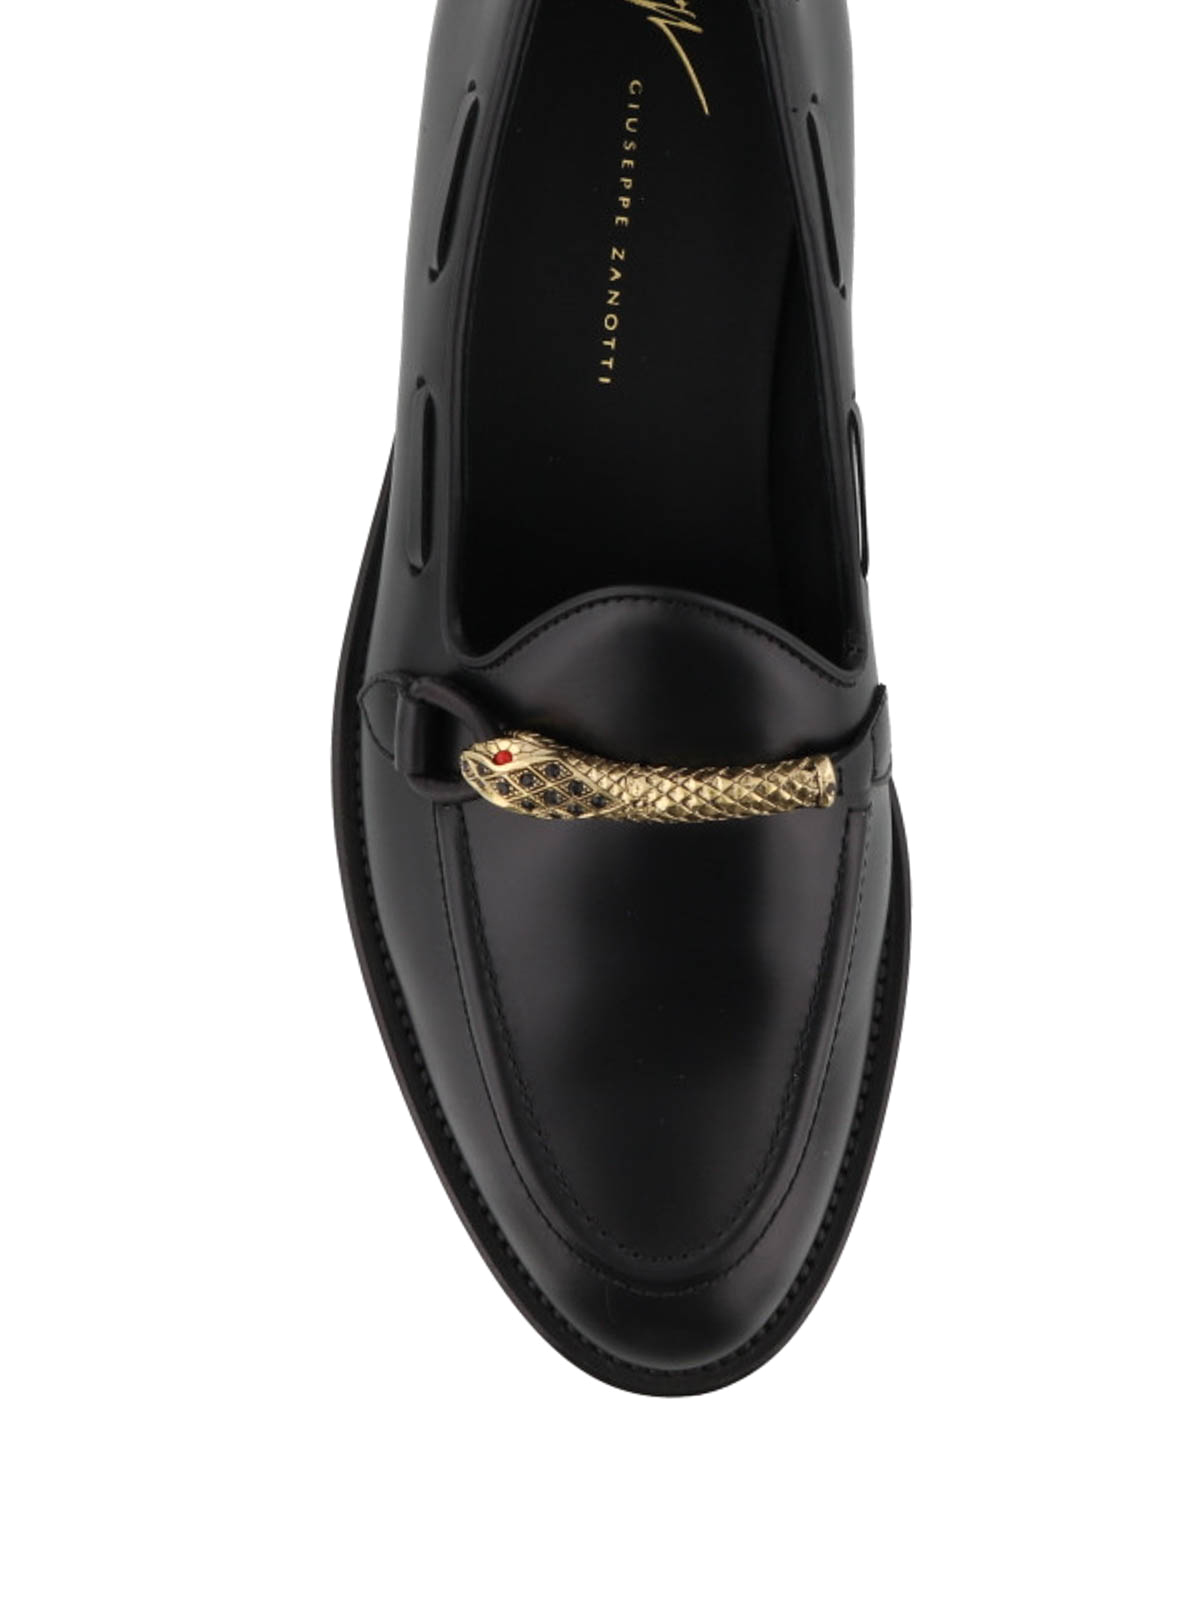 Giuseppe Zanotti - Grady loafers with